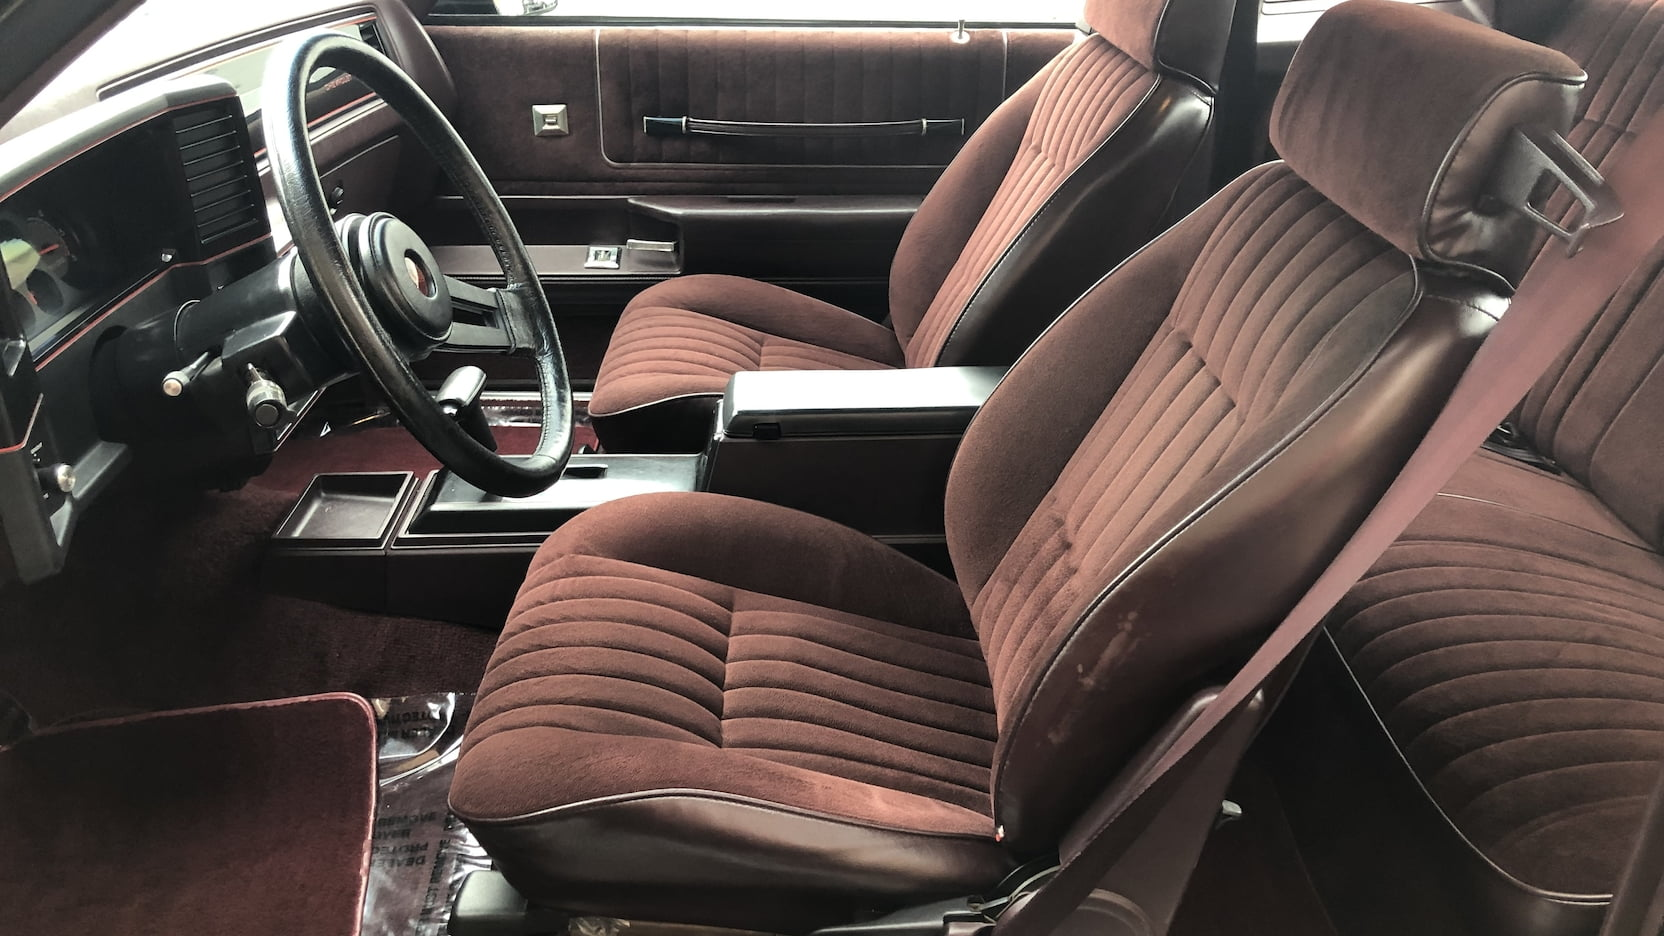 1986 Chevrolet Monte Carlo SS interior